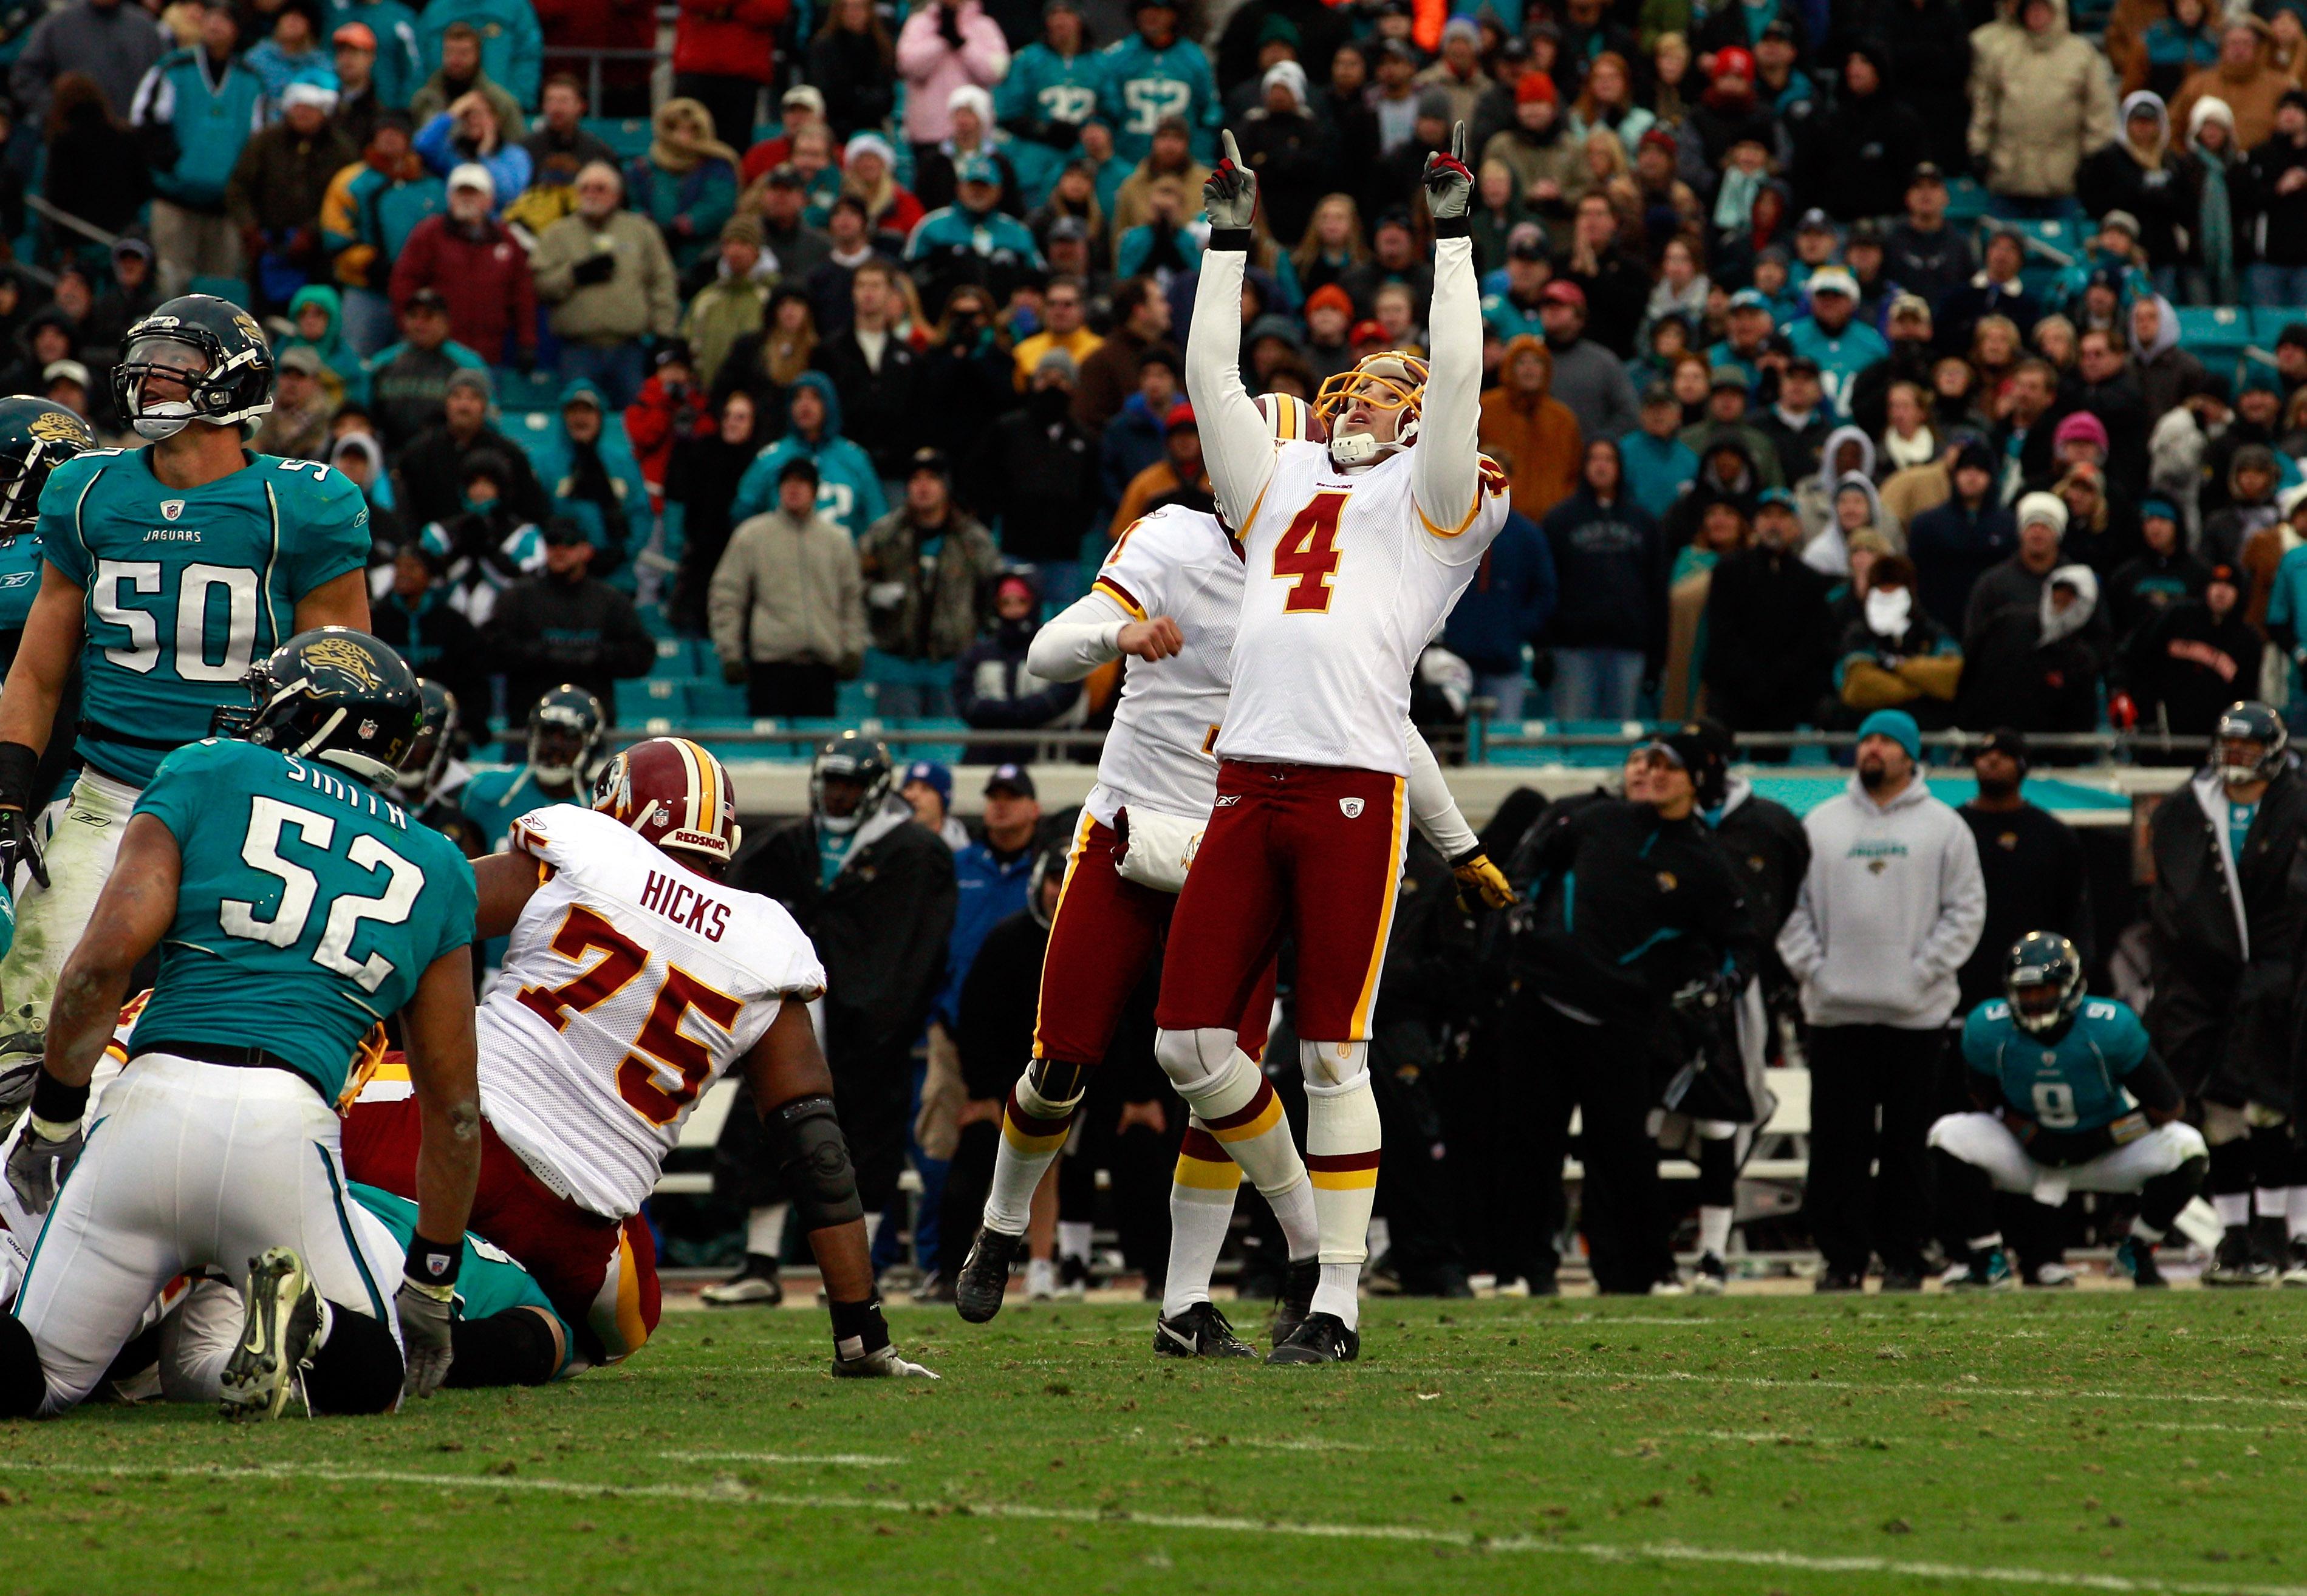 JACKSONVILLE, FL - DECEMBER 26:  Kicker Graham Gano #4 of the Washington Redskins celebrates after kicking the winning field goal in overtime during the game against the Jacksonville Jaguars at EverBank Field on December 26, 2010 in Jacksonville, Florida.